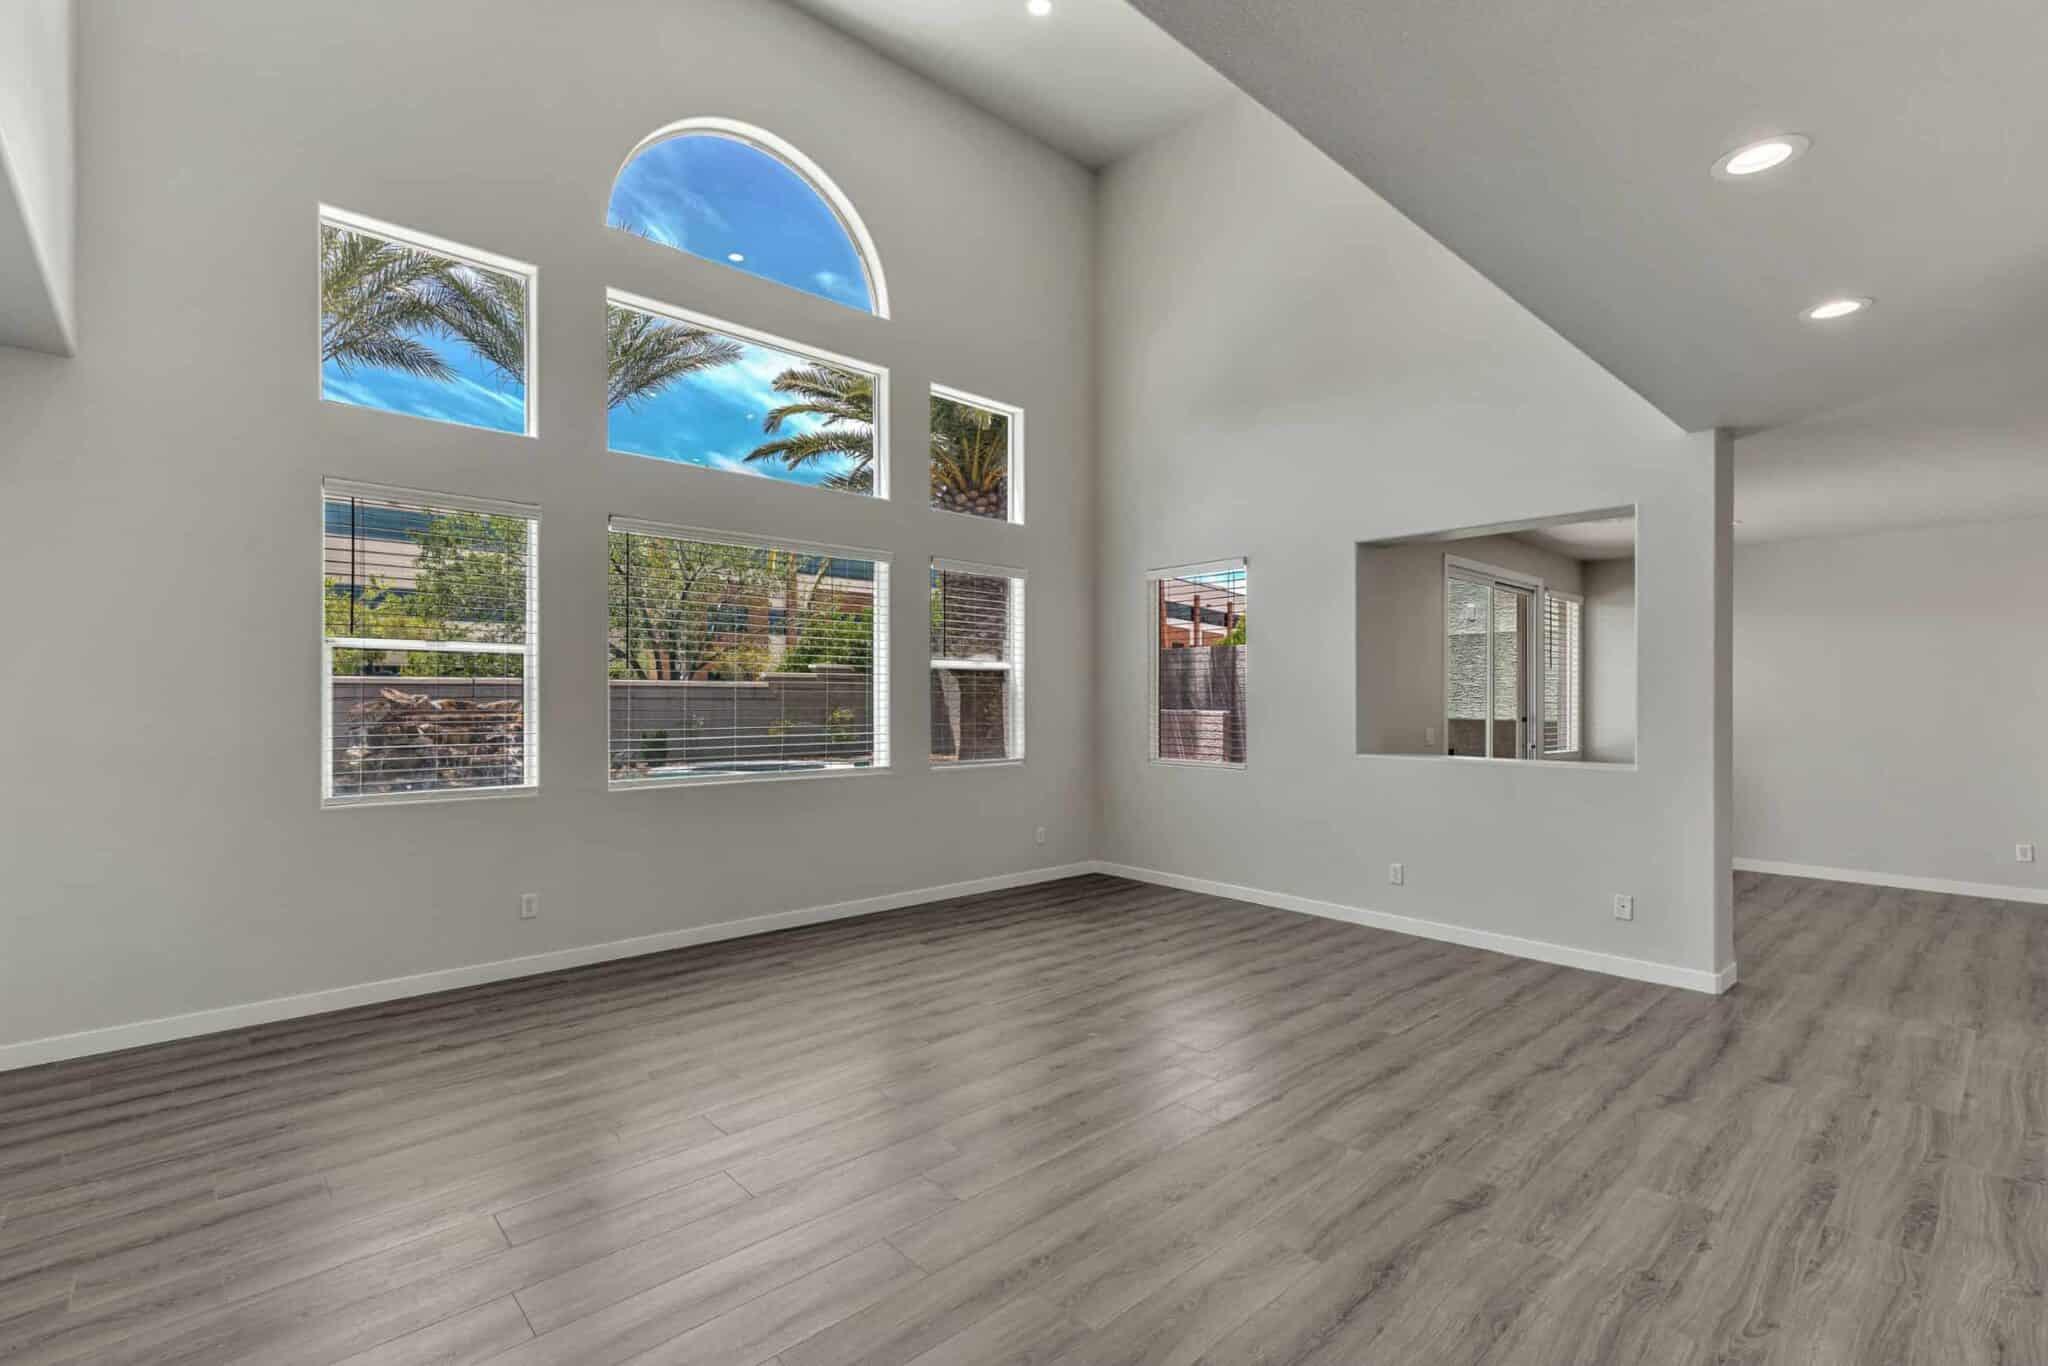 las-vegas-luxry-real-estate-realtor-rob-jensen-company-10491-haywood-drive-summerlin13